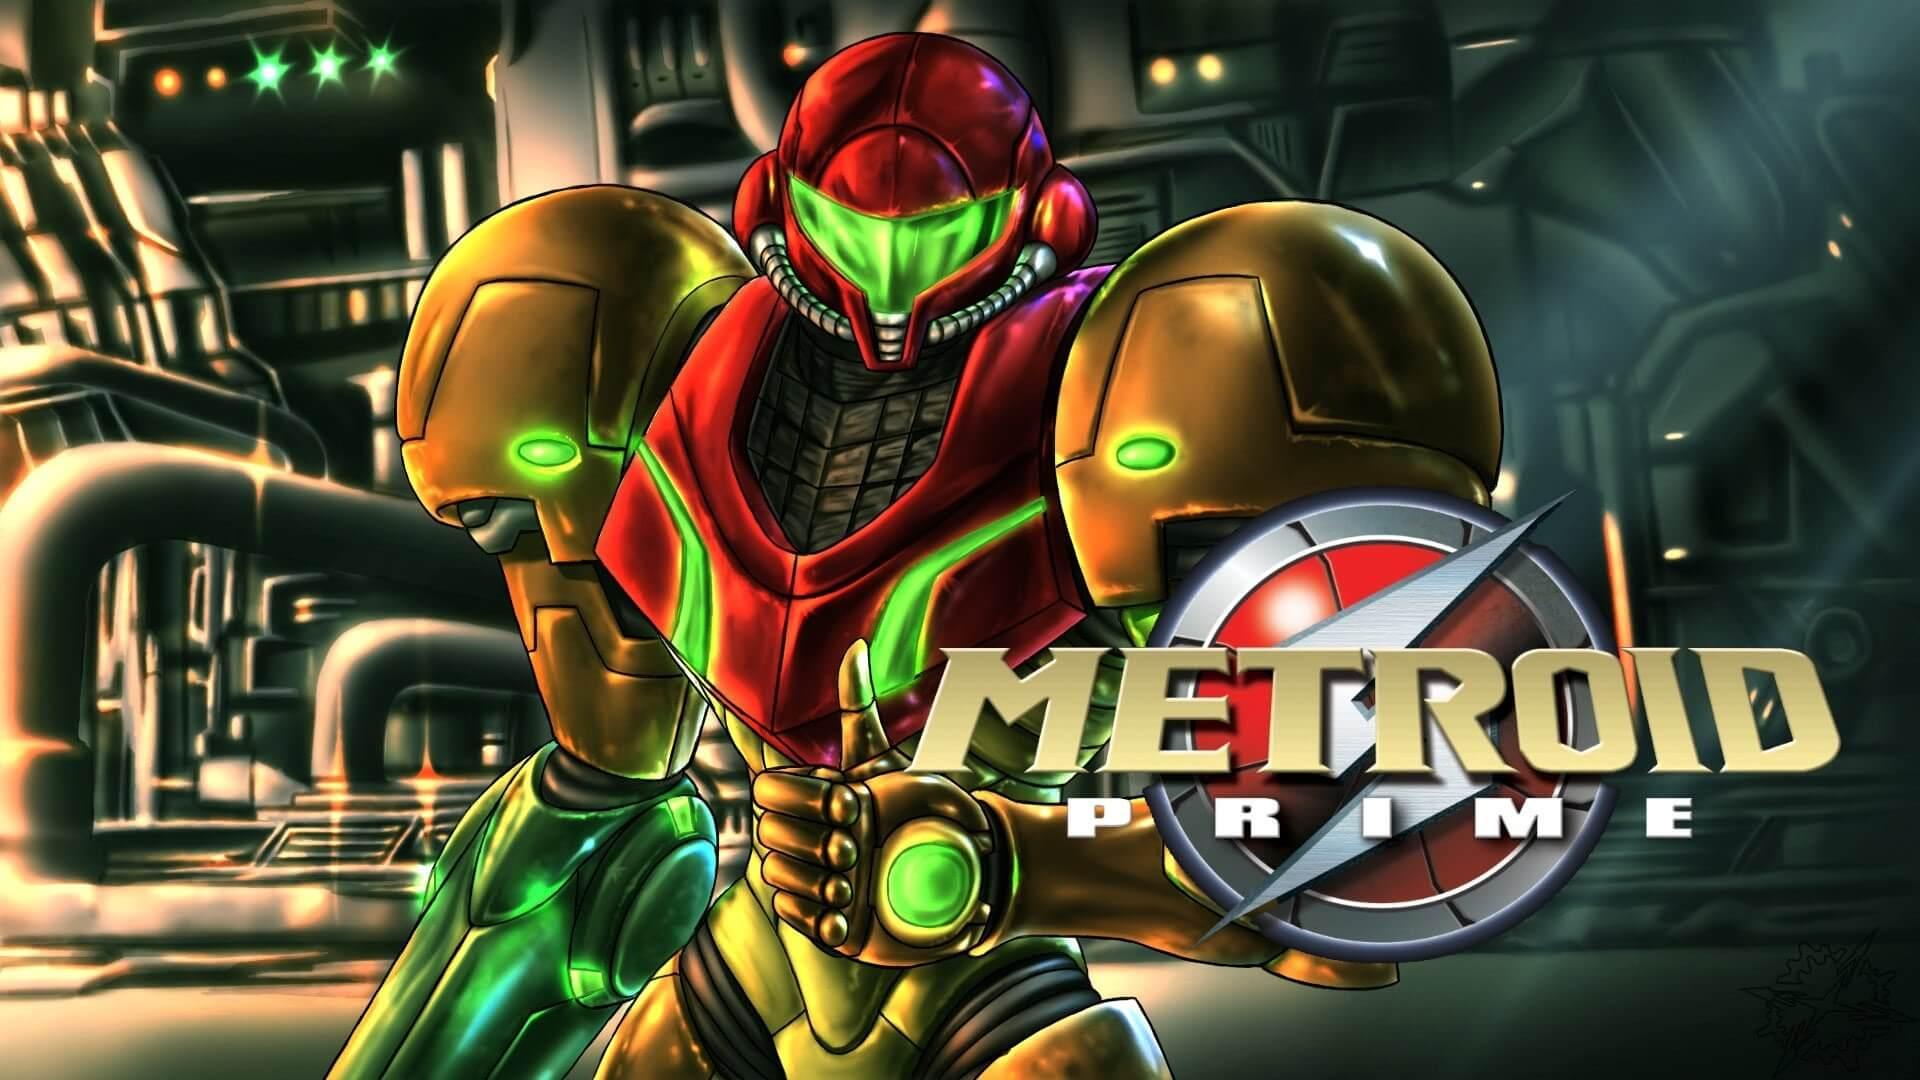 Metroid Prime gets an AI-enhanced ESRGAN HD texture pack, improves more than 9000 textures